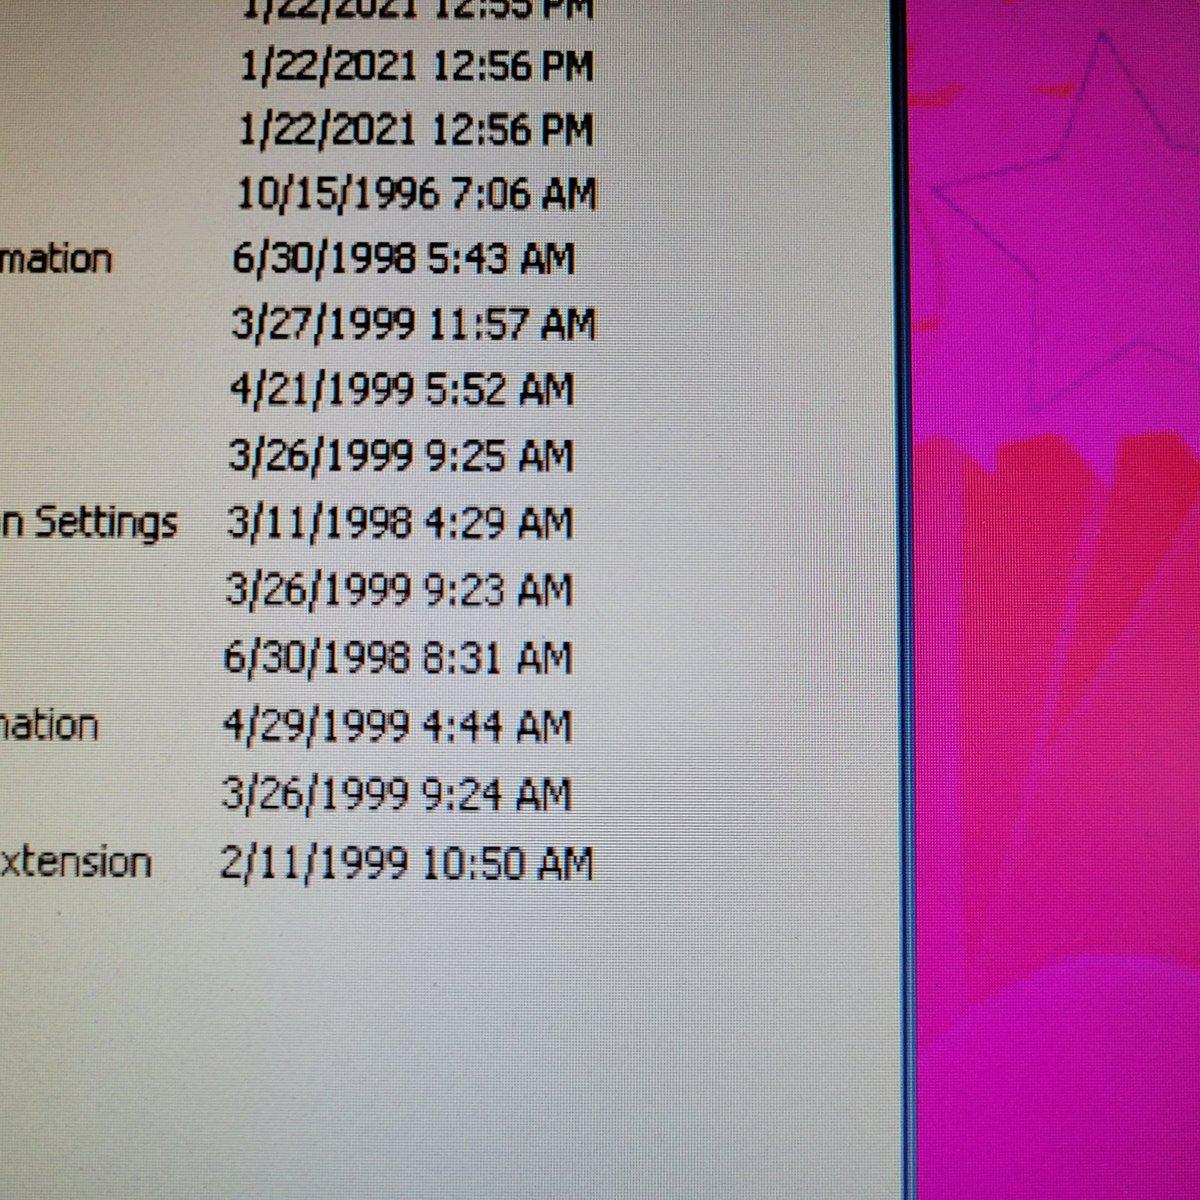 Tell me these files are older than you #idareyou #lol #windowsME